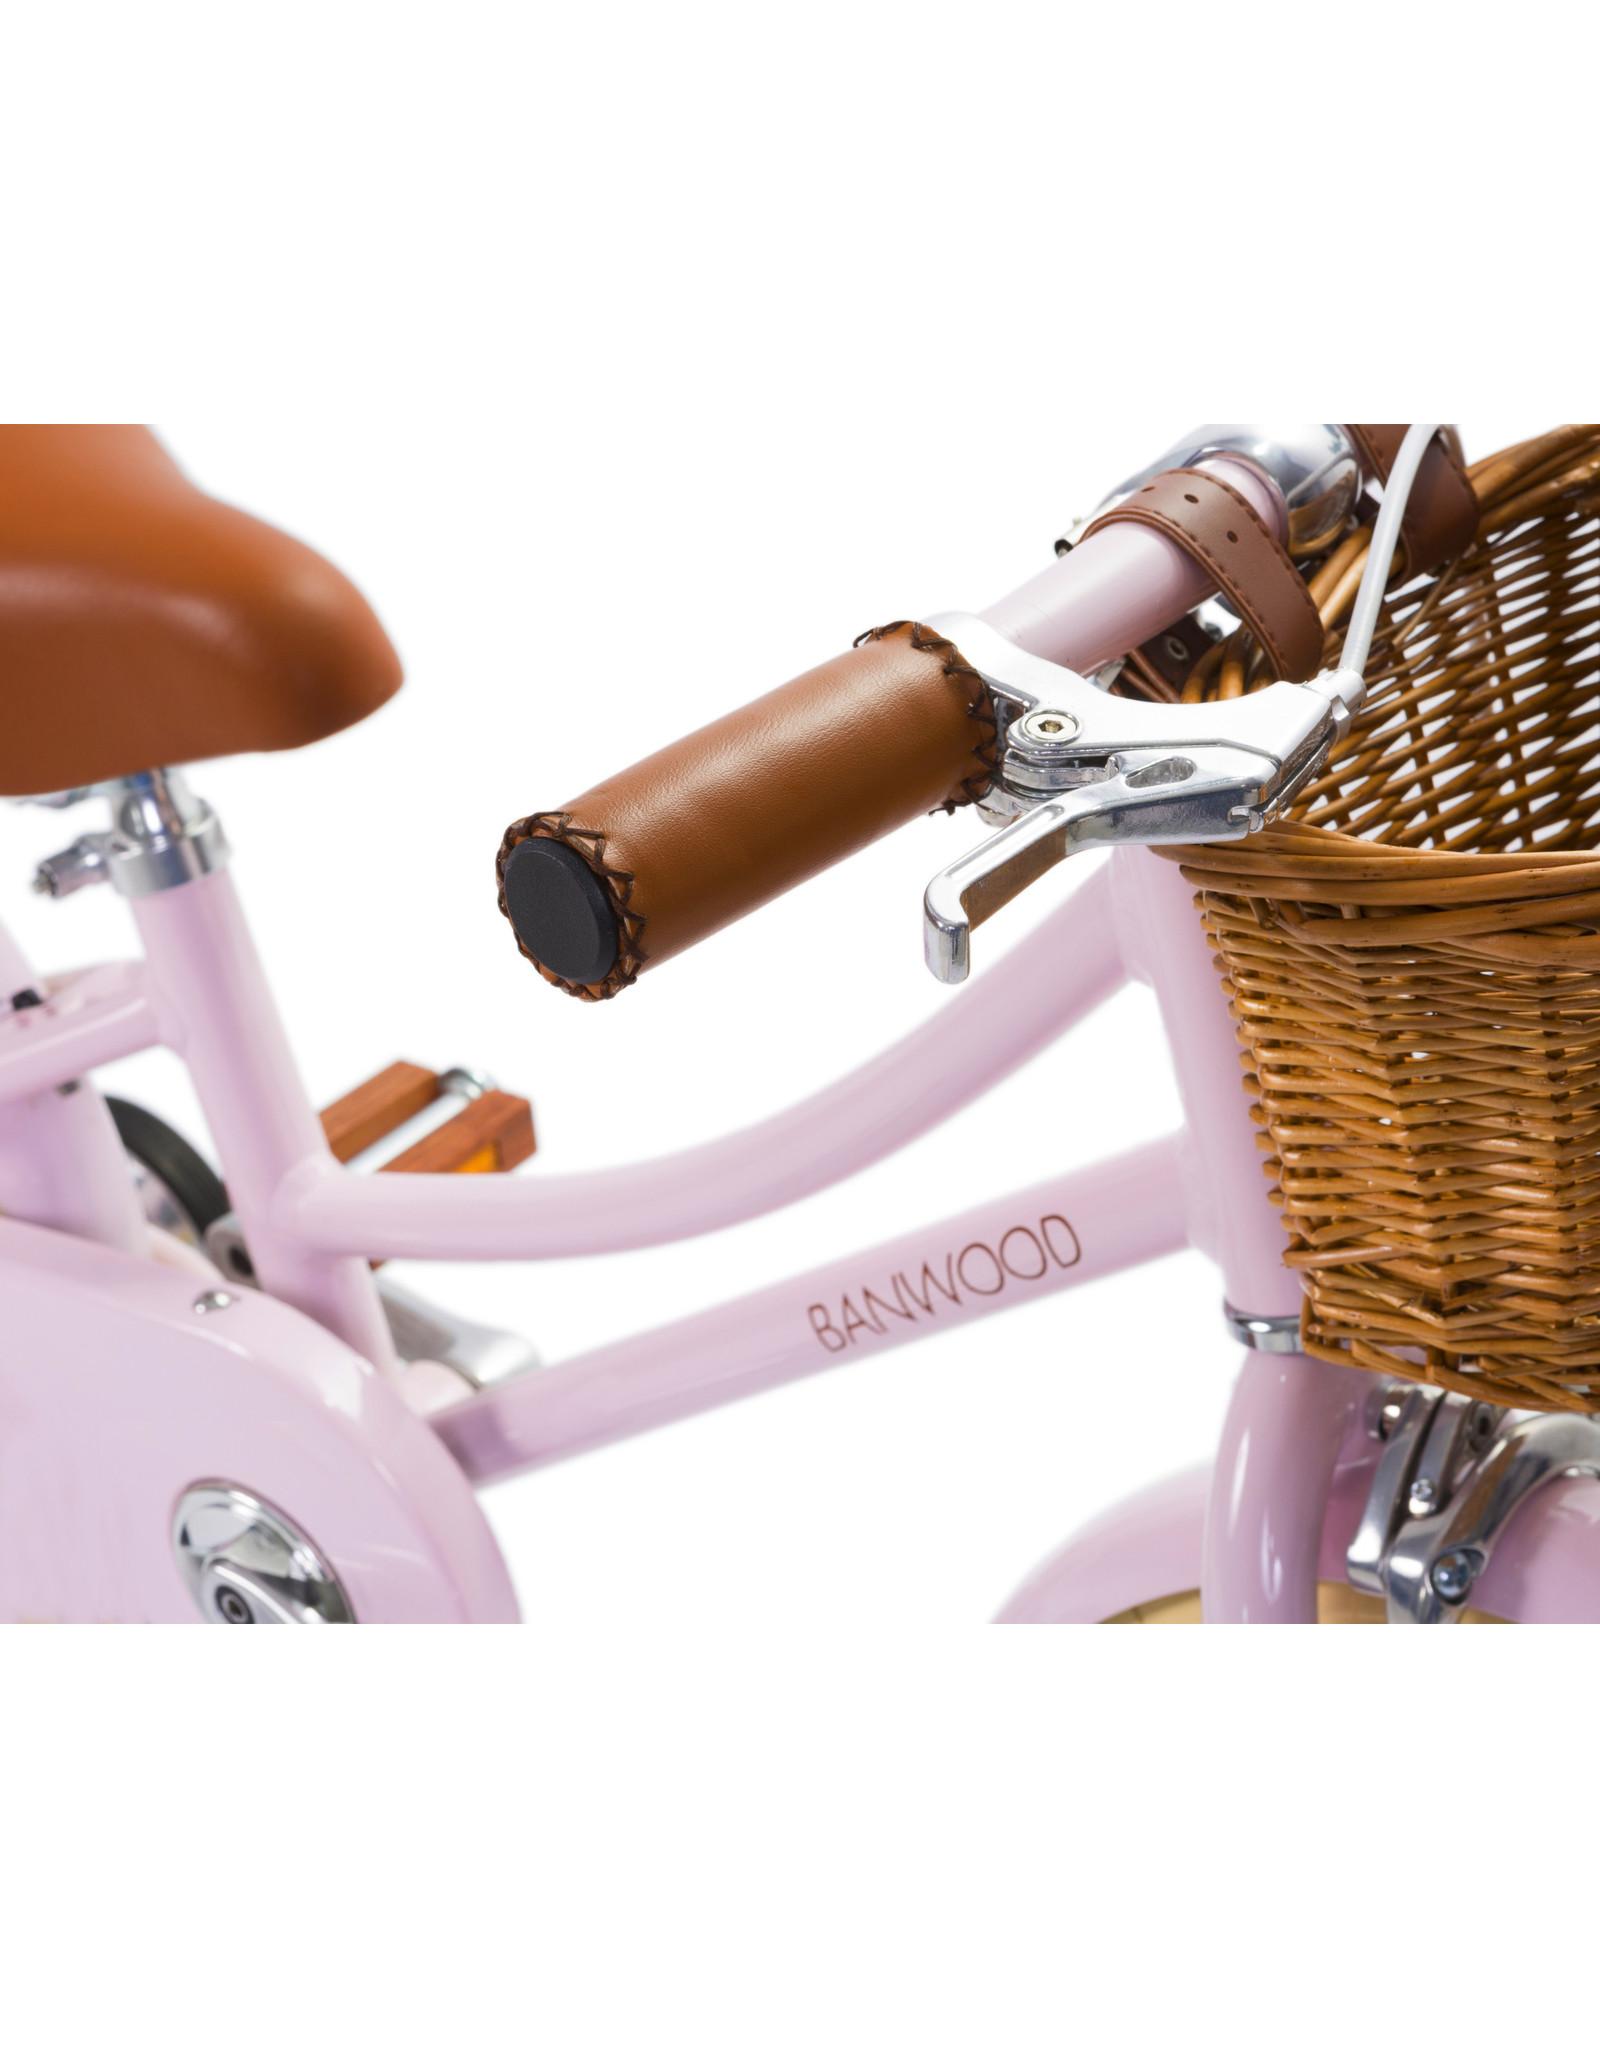 BANWOOD Pink Classic Pedal Bike